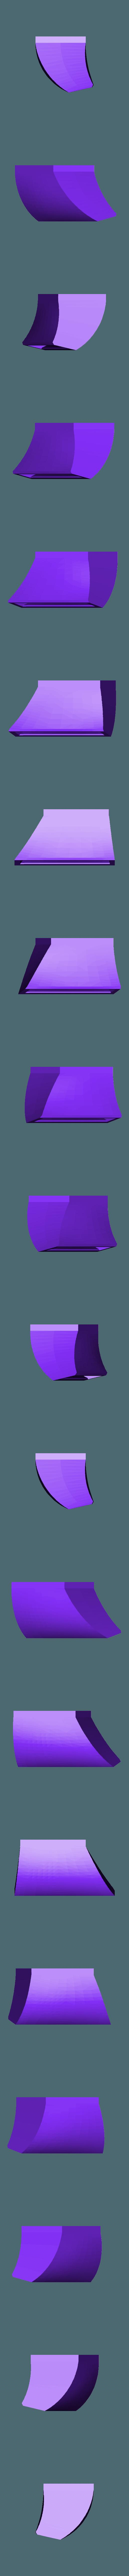 Fanduct_chimera_-_cyclops.STL Download free STL file Prusa I3 Steel V2 Makerparts - Laser Cut • Template to 3D print, Agos3D